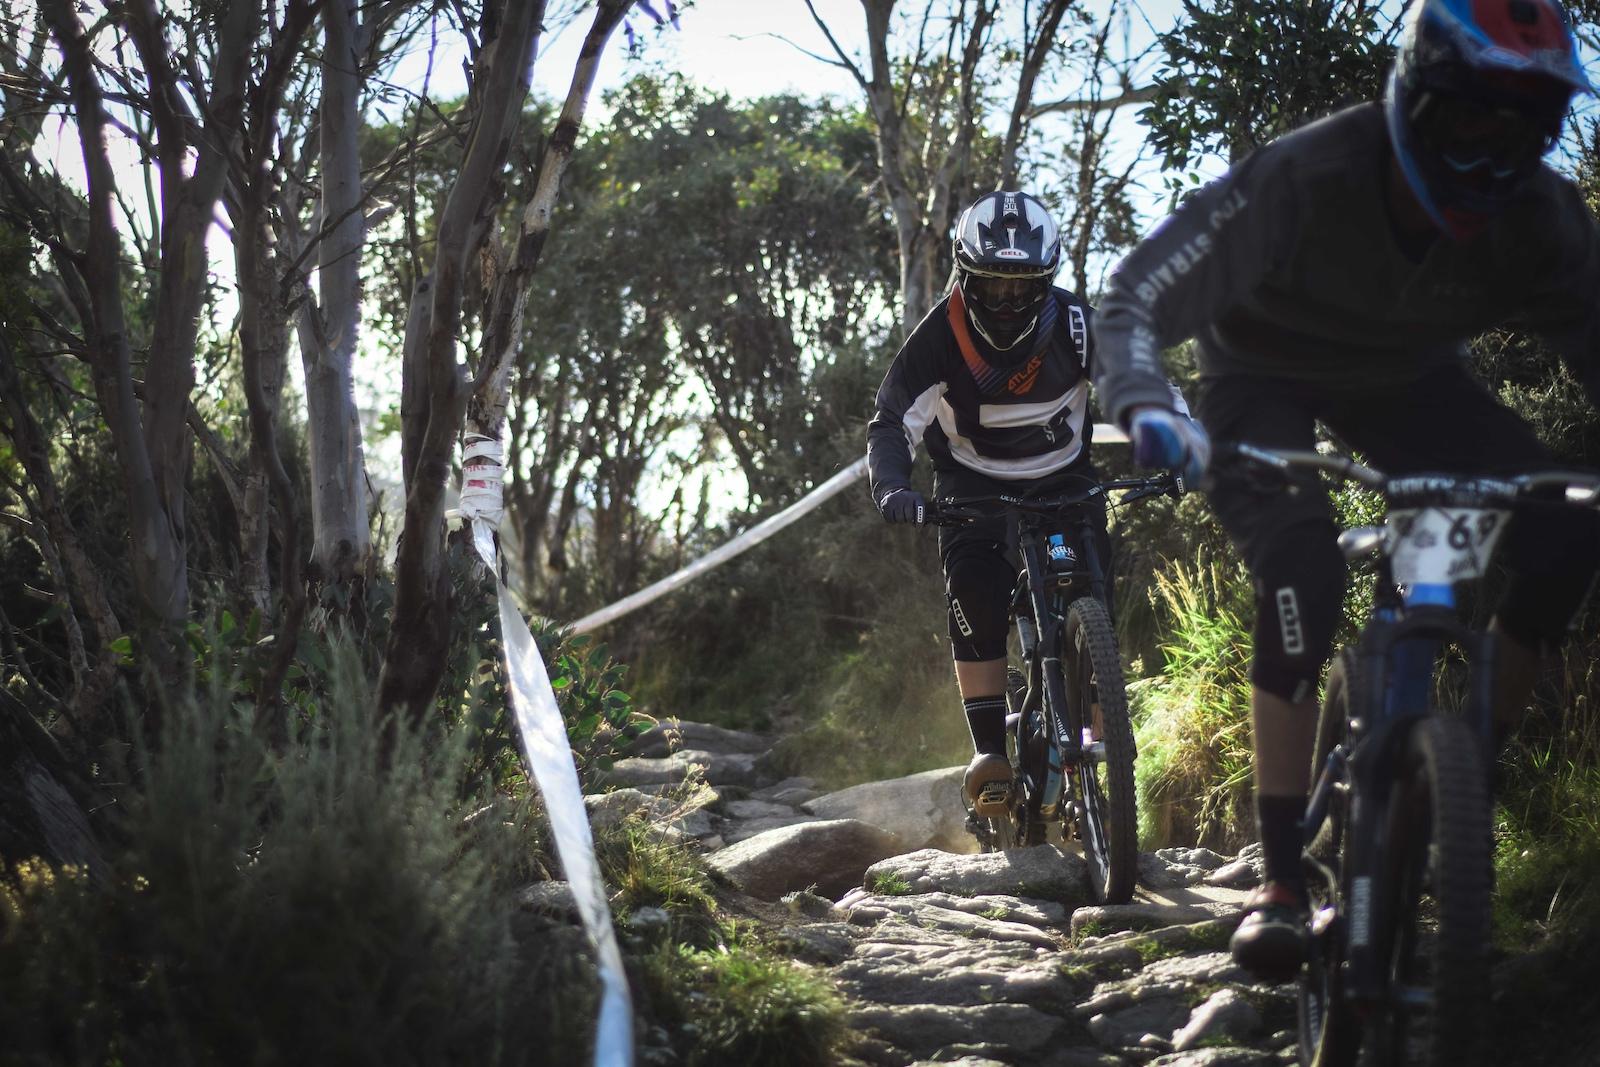 Enduro and downhill boys a like all had fun while tackling the terrain. Isaac Ridley hunting down Jaden Mann